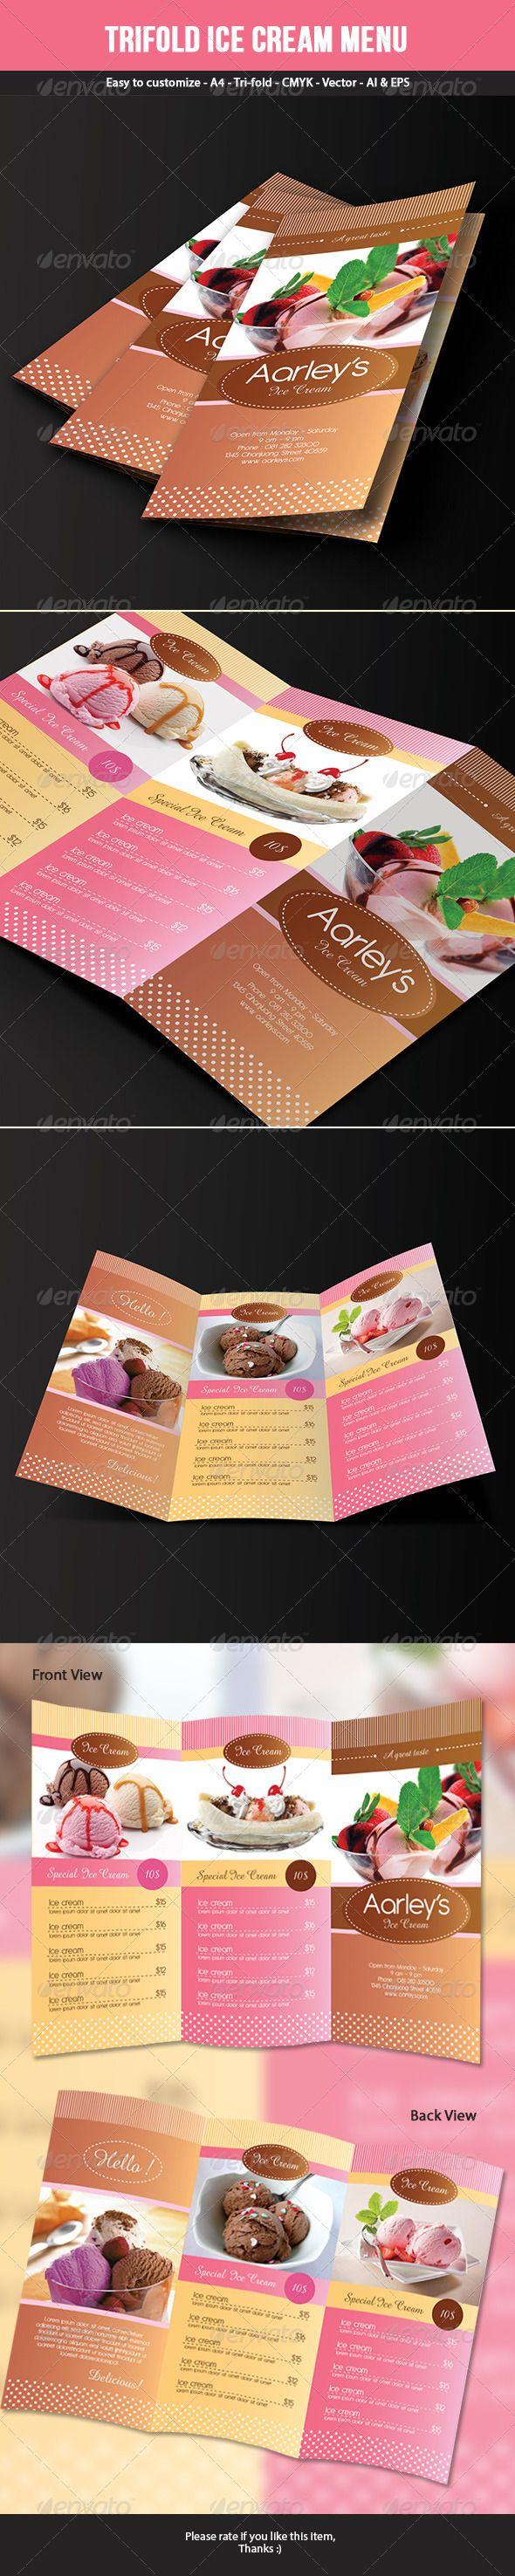 Trifold Ice Cream Menu Template | Tarjetas presentacion, Identidad ...